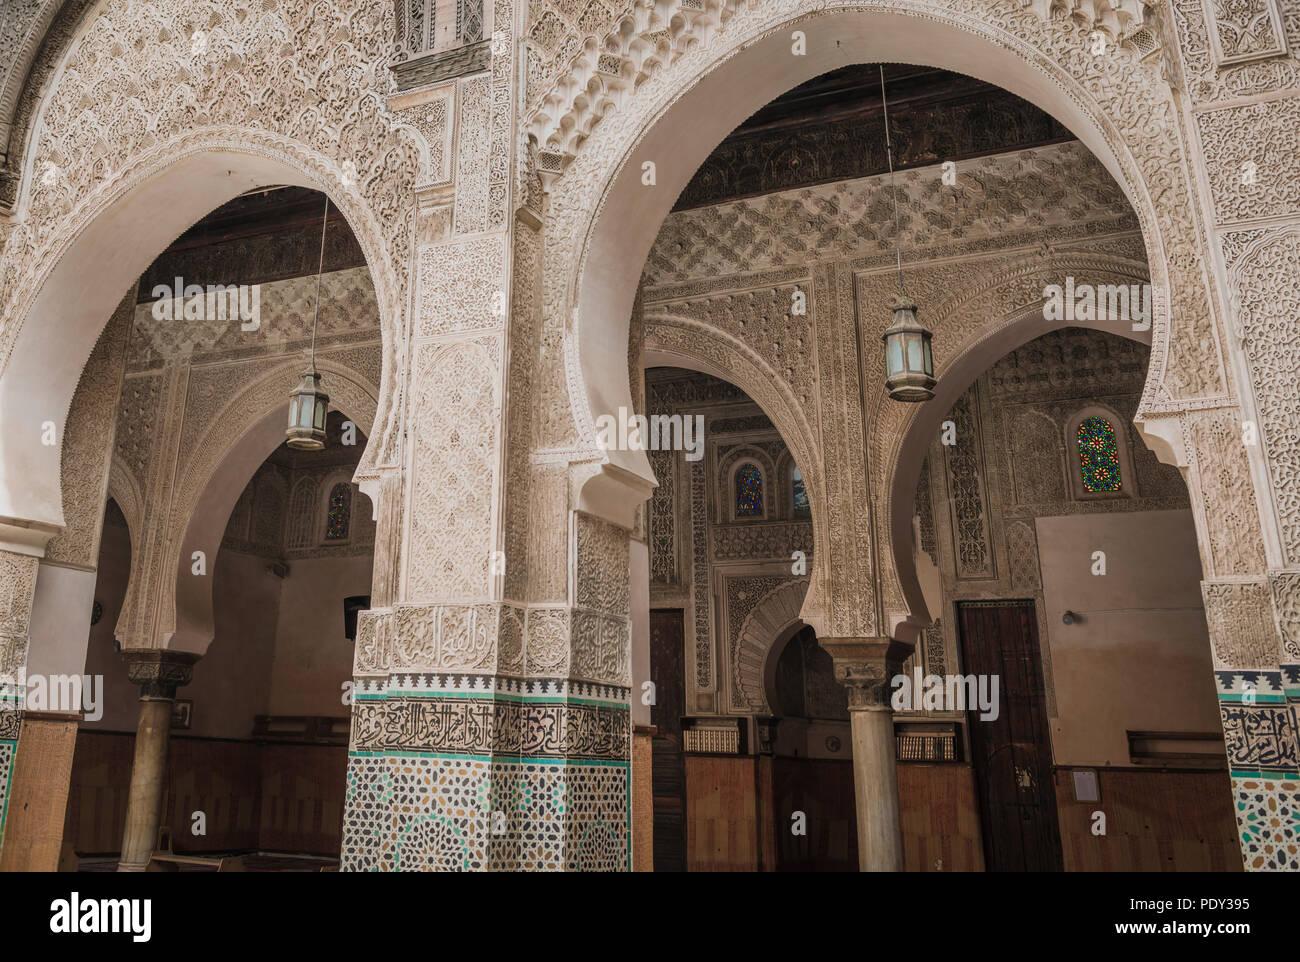 Madrasa Bou Inania, madrasas, Arabic ornaments, Fes, Morocco - Stock Image